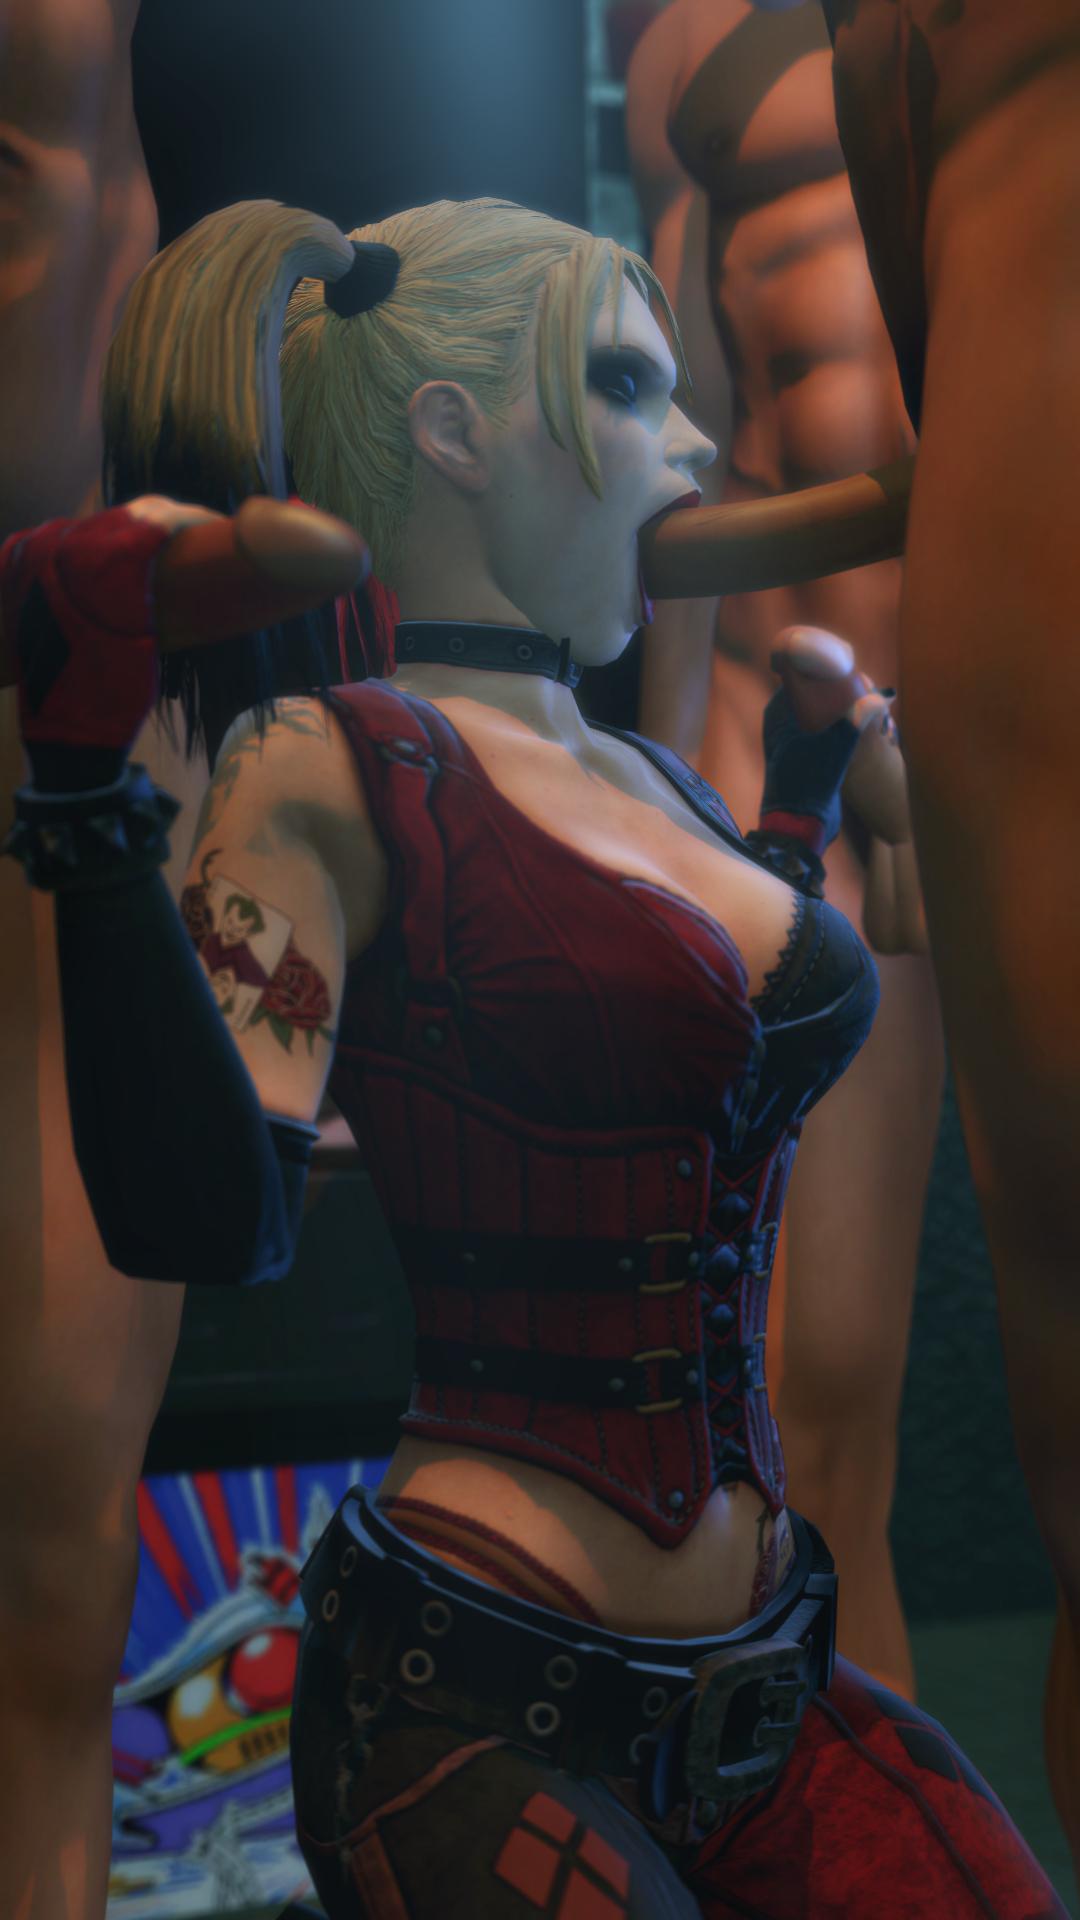 Batman arkharm city nude mod erotic pics